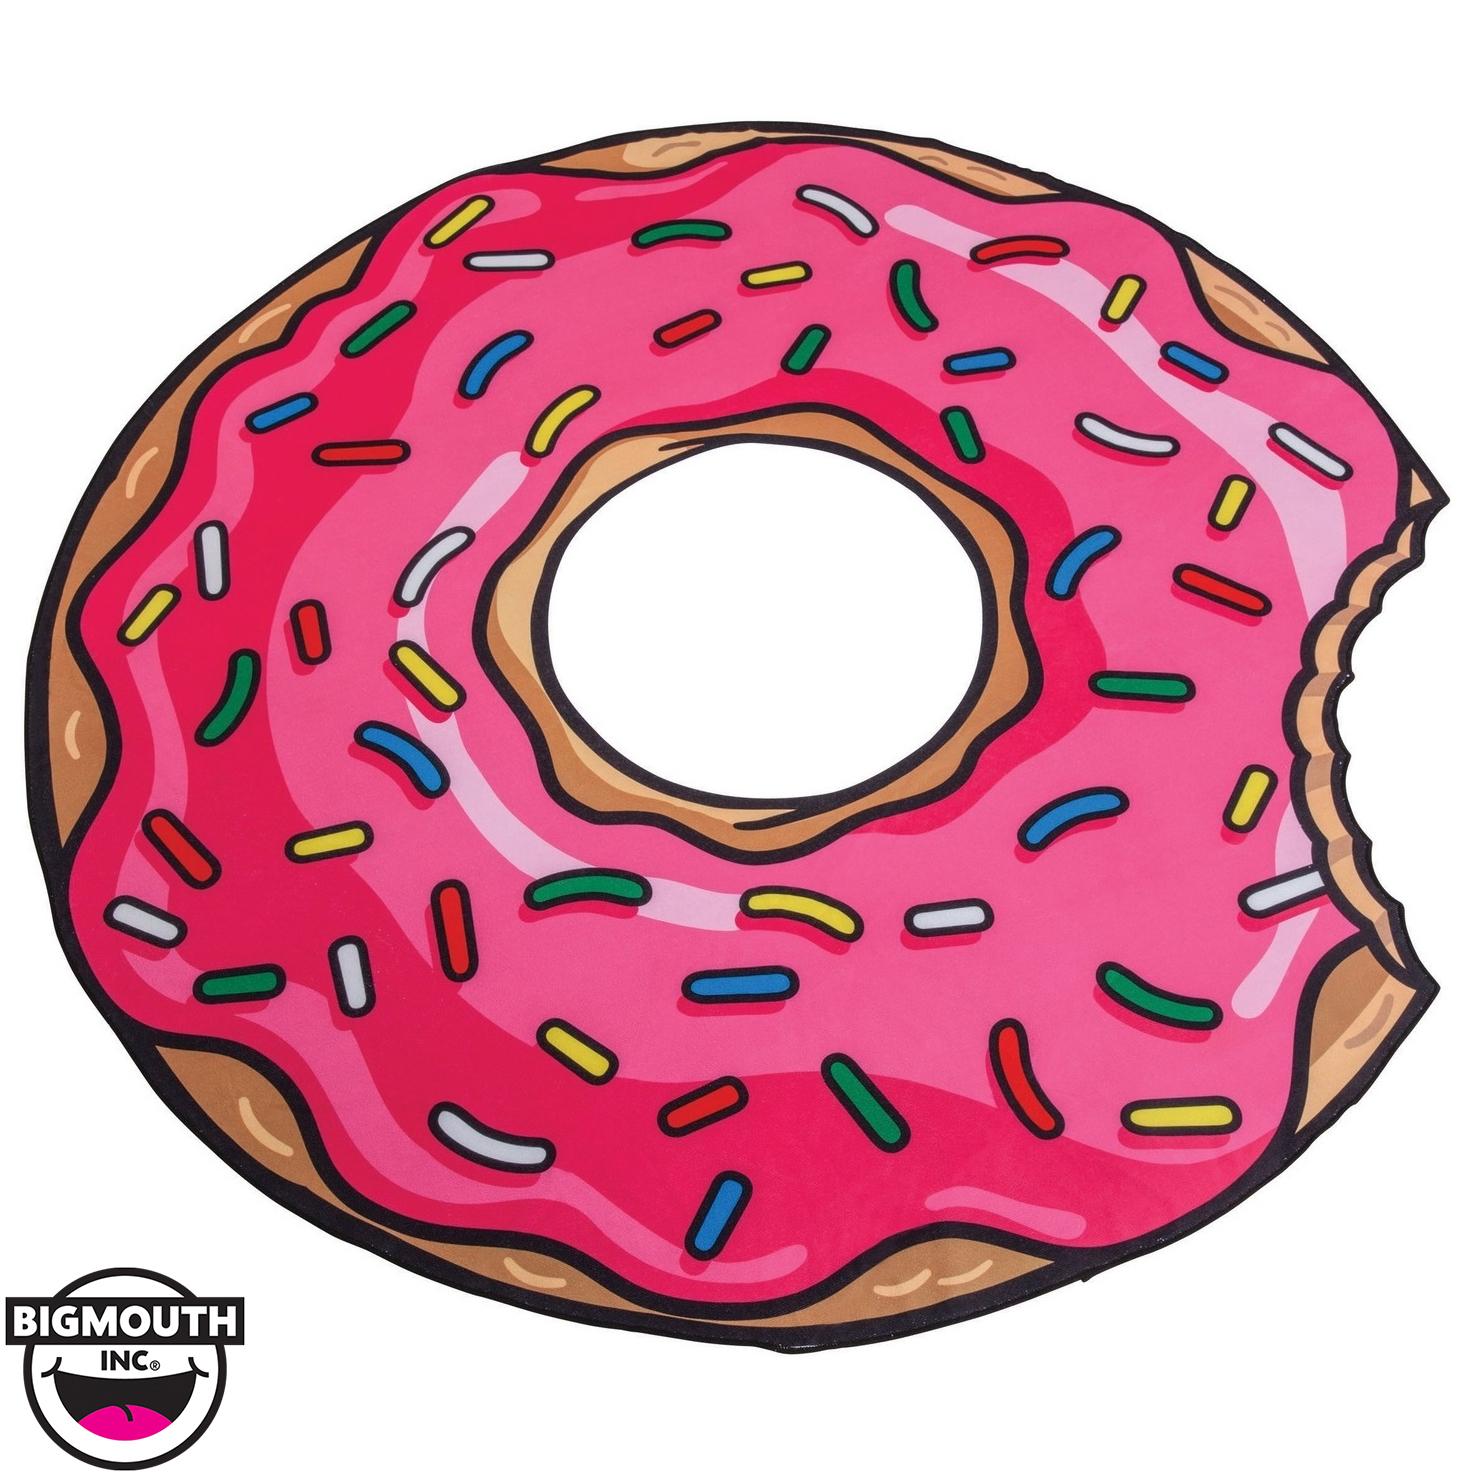 BigMouth Inc - Gigantic Pink Donut Towel image